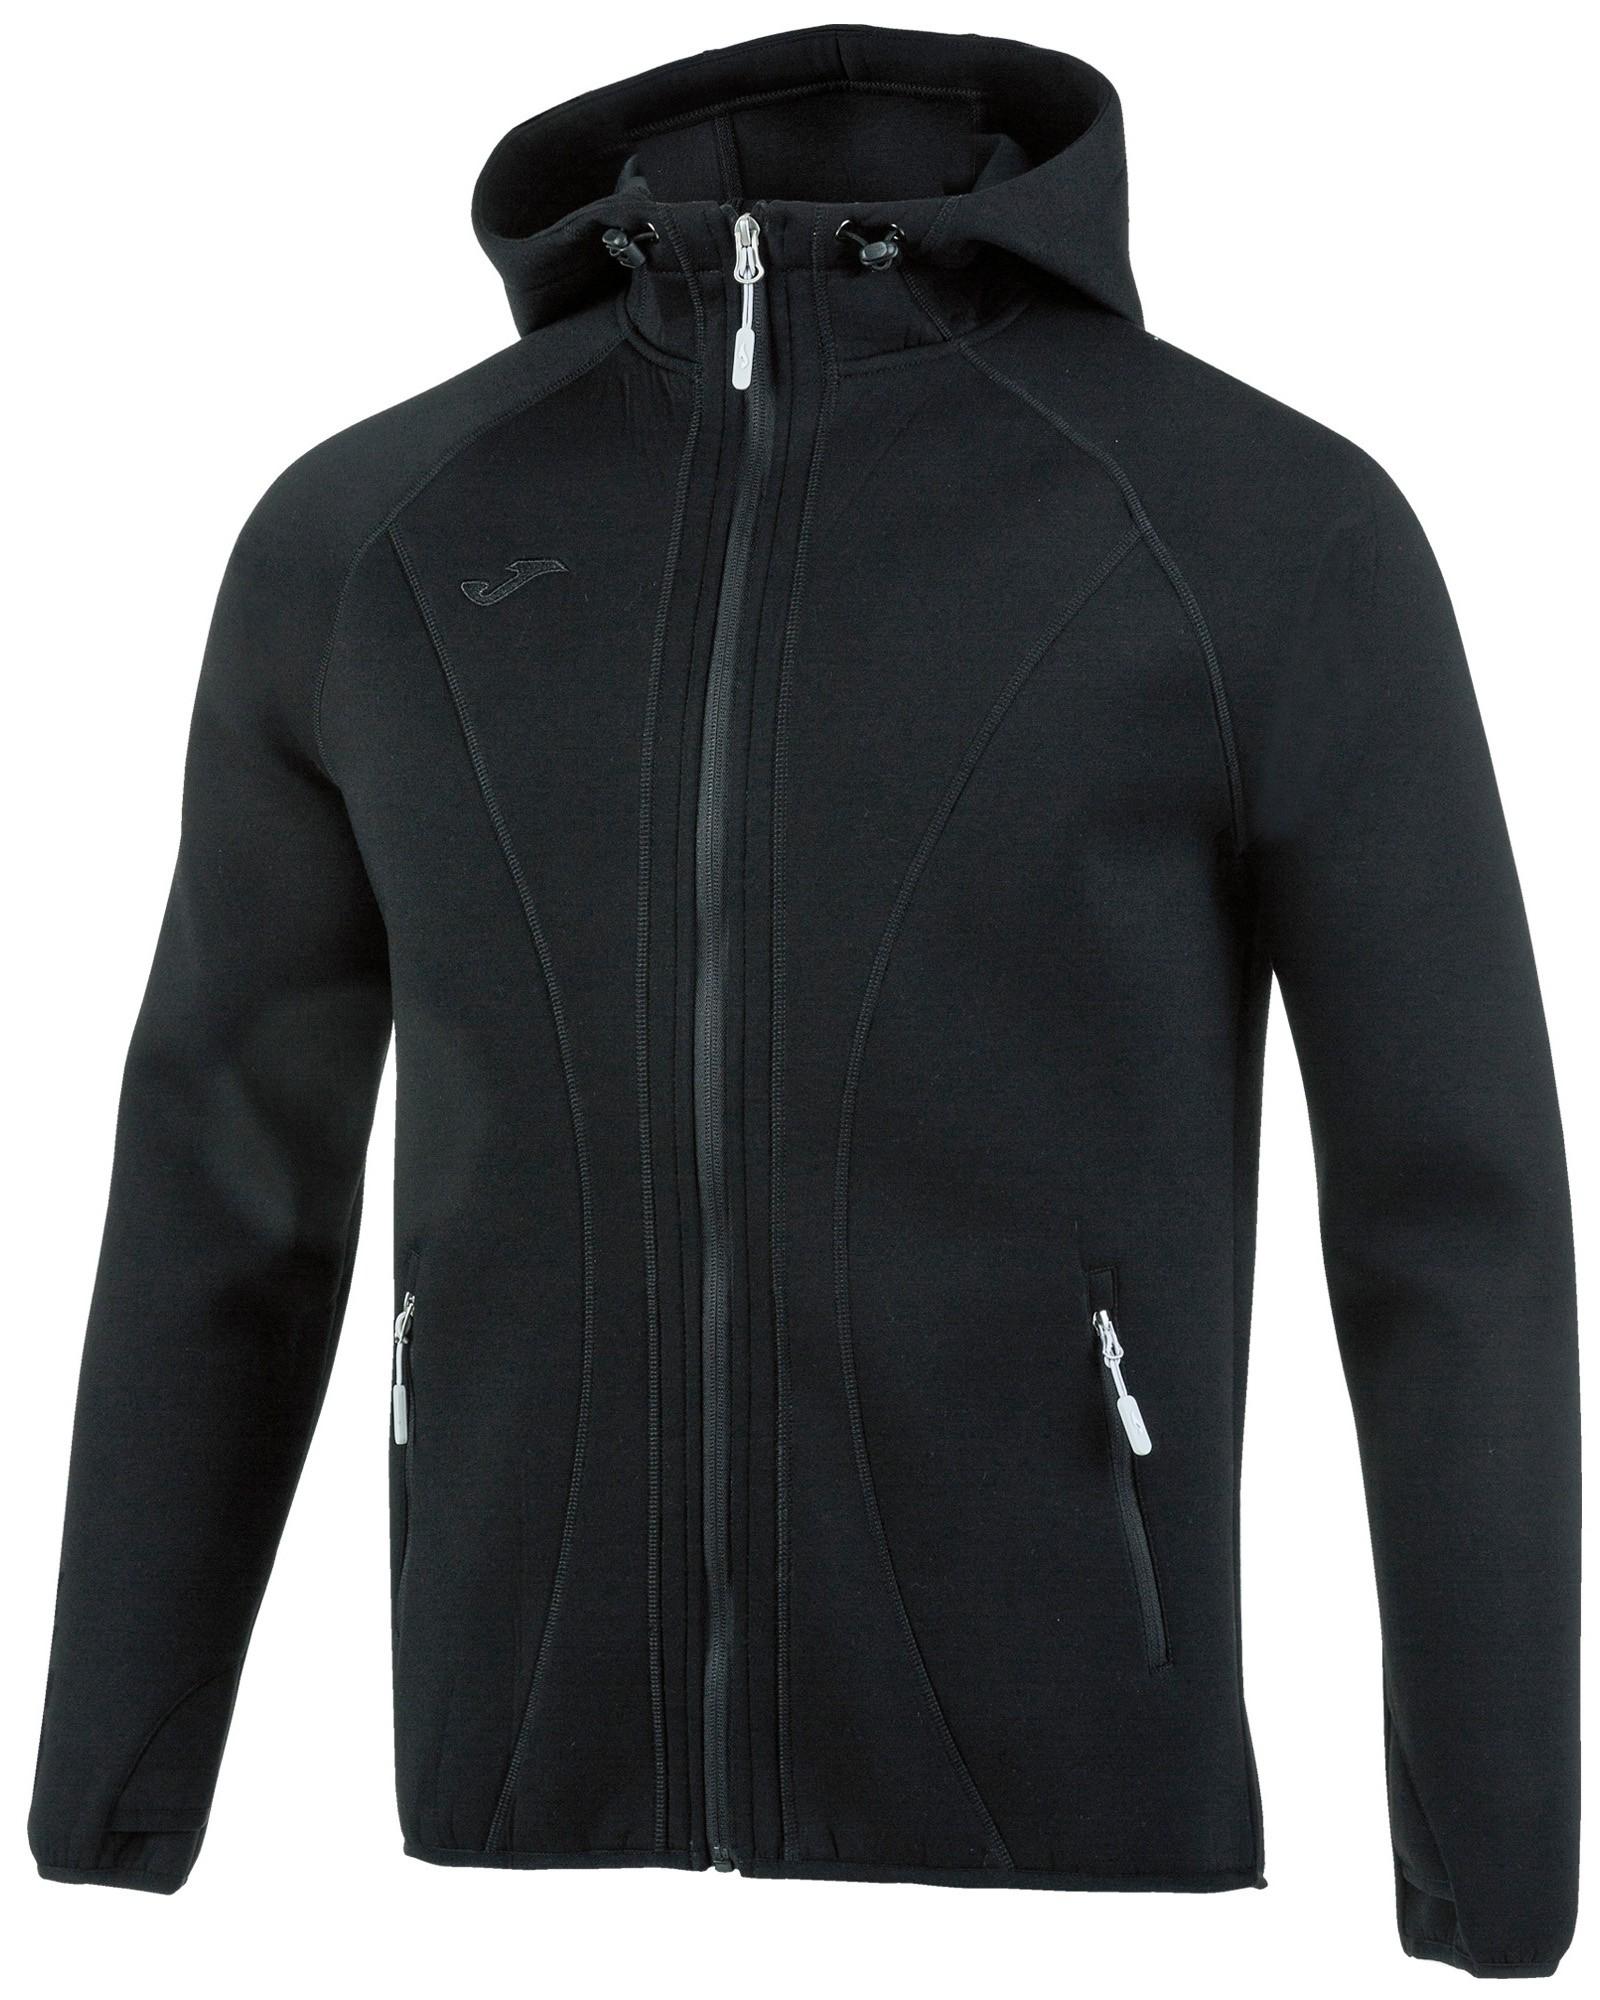 Joma Giacca Sportiva sport Jacket SoftShell Basilea con TASCHE a ZIP -Nero - 1000